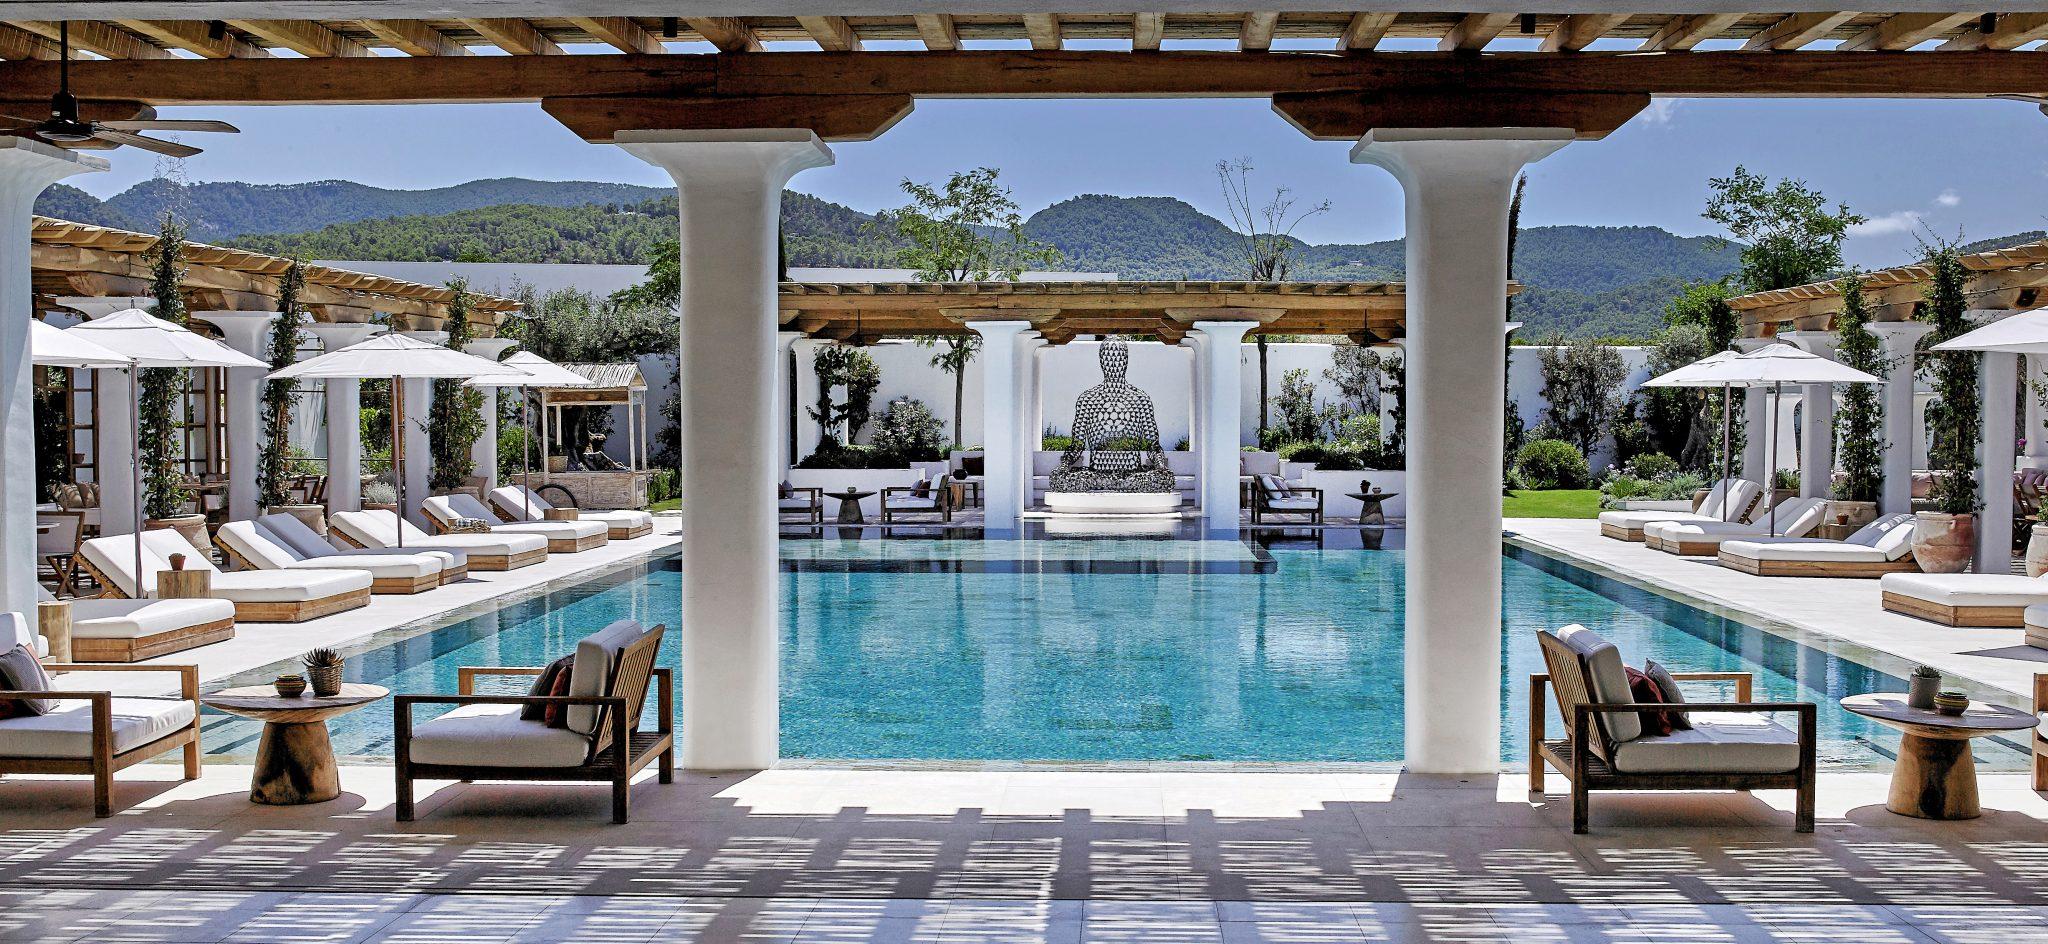 Sabina Ibiza spiritual home_ Sabina Estate Clubhouse Blakstad Ibiza 2019 CF134208 1 (1) (1)